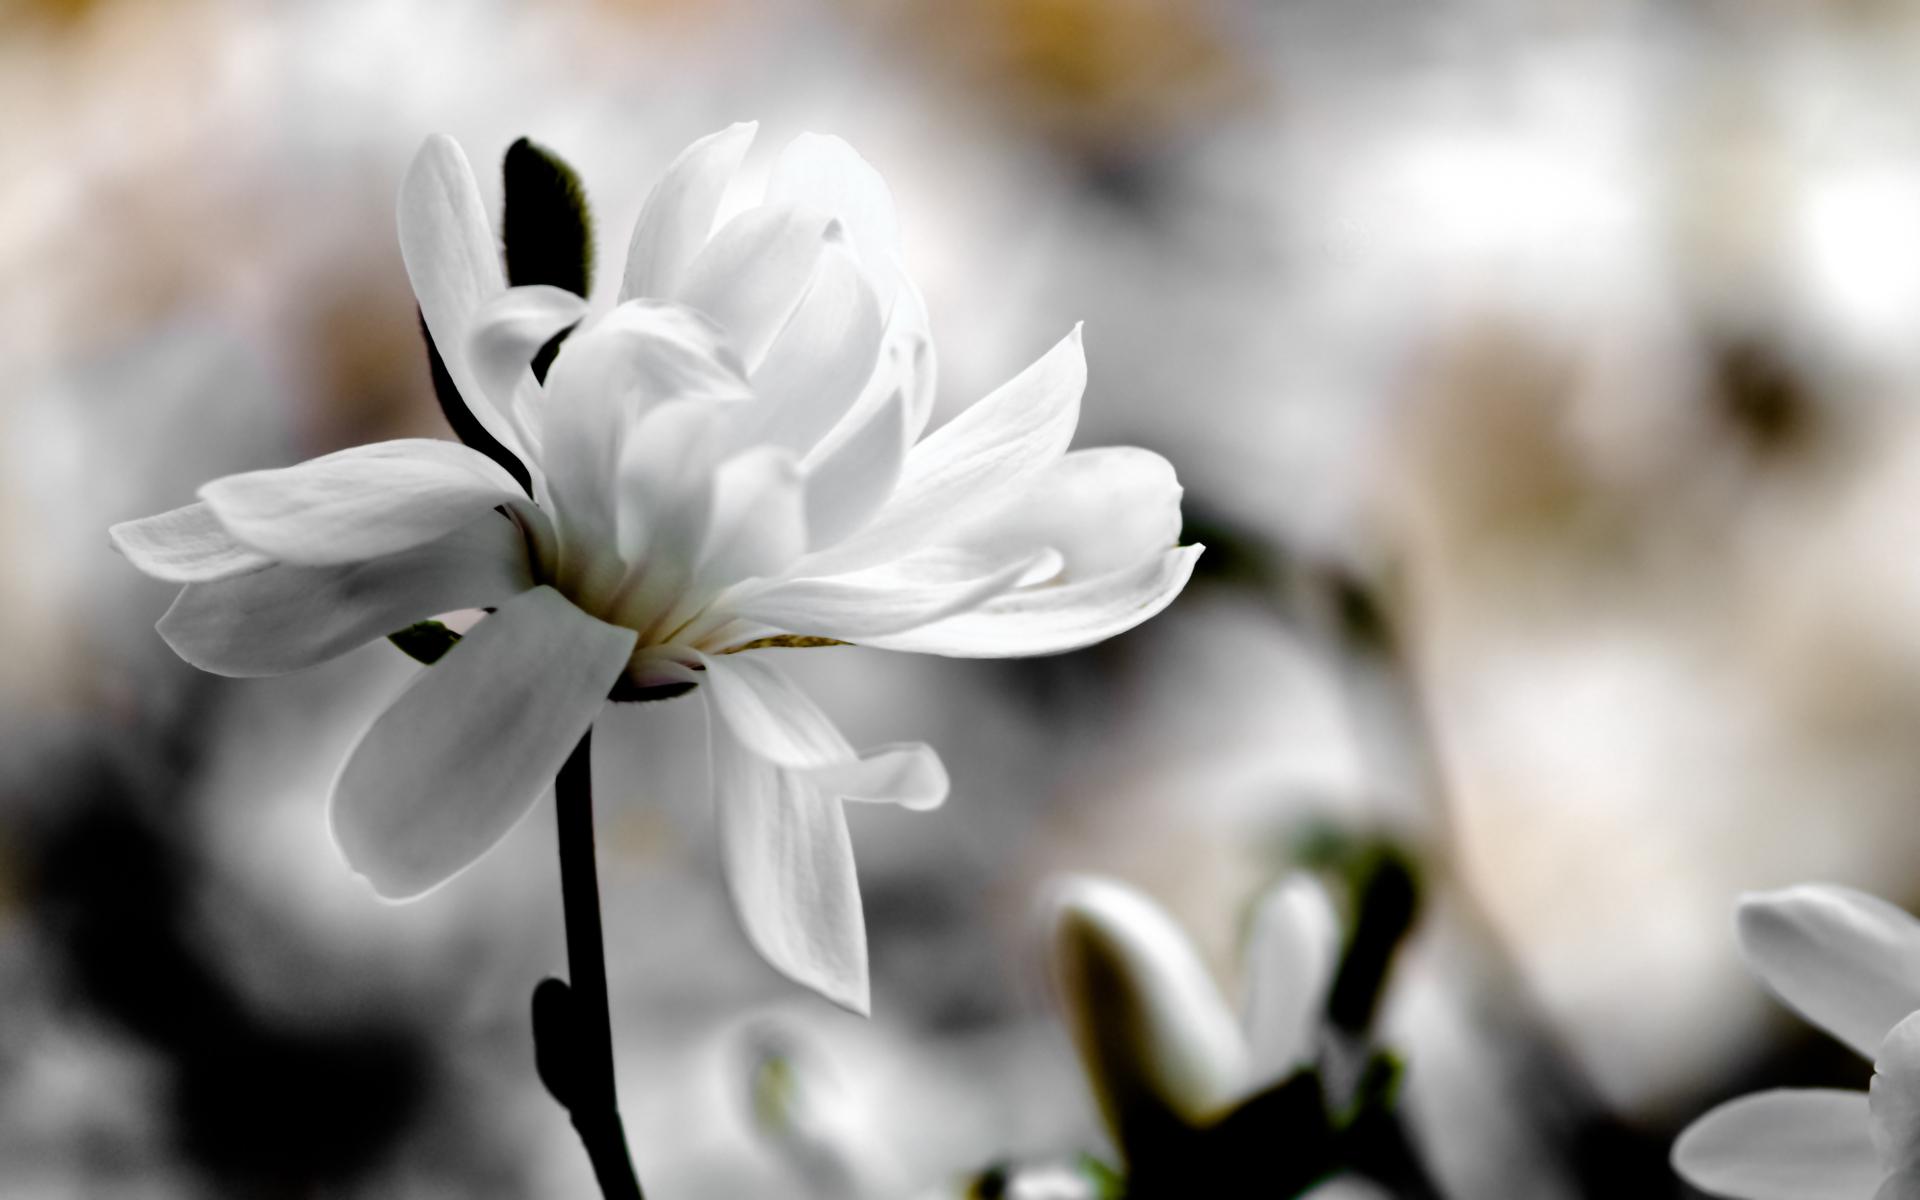 ... flower,macro,spring,magnolia,background,blur,white,flowers